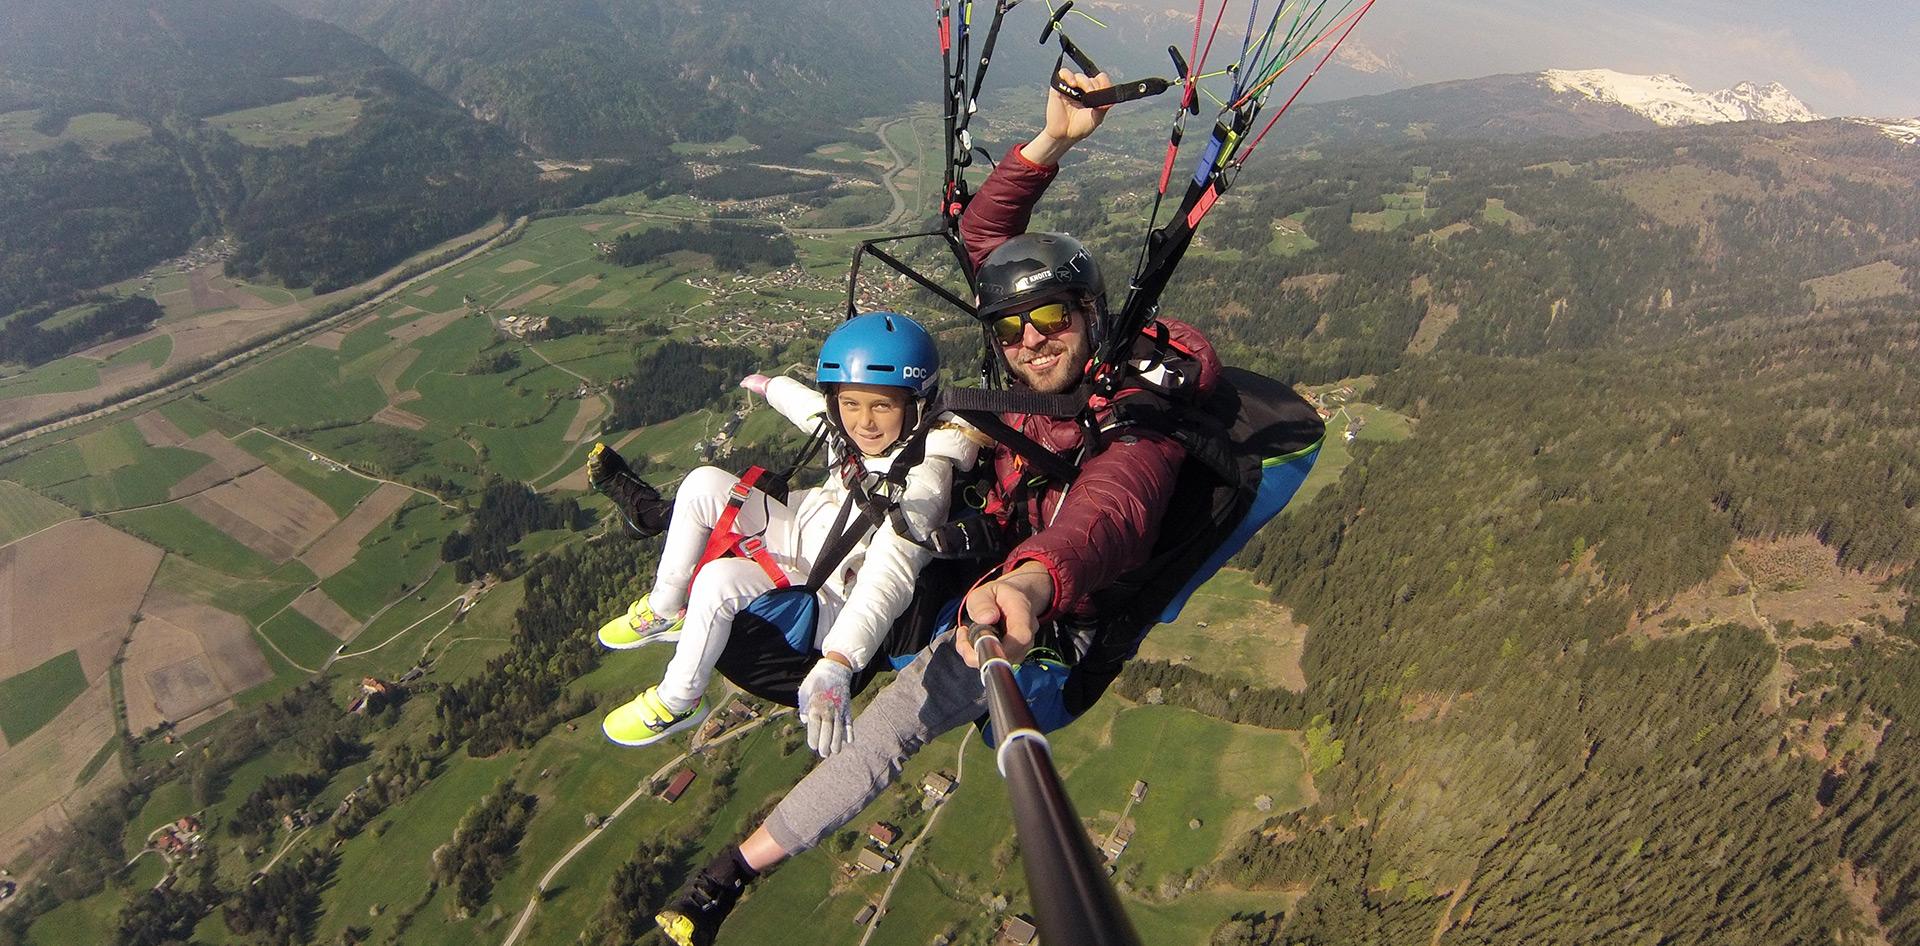 1920x946_fpKIDS-tandem-paragliding-gleitschirm